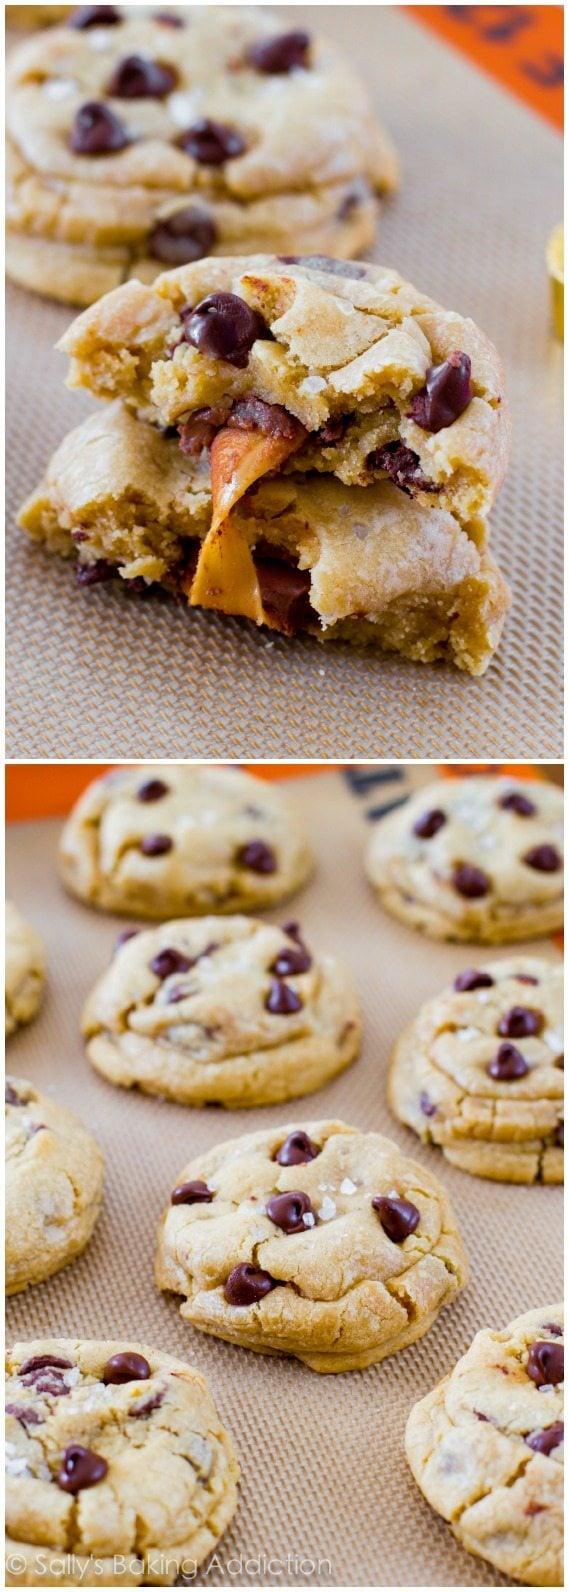 Salted Caramel Chocolate Chip Cookies - Sallys Baking Addiction